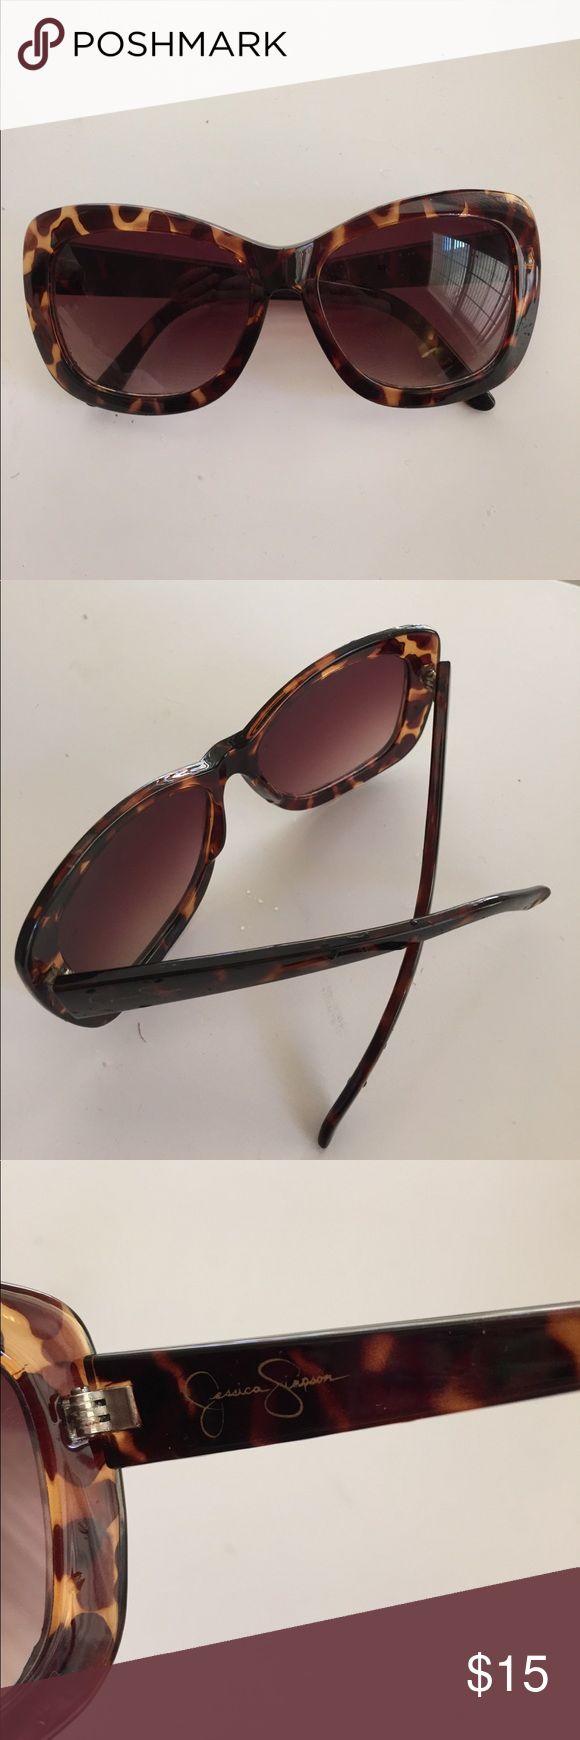 Jessica Simpson Tortious Shell Sunglasses Tortious shell Sunglasses. No case. Little wear. Jessica Simpson Accessories Sunglasses